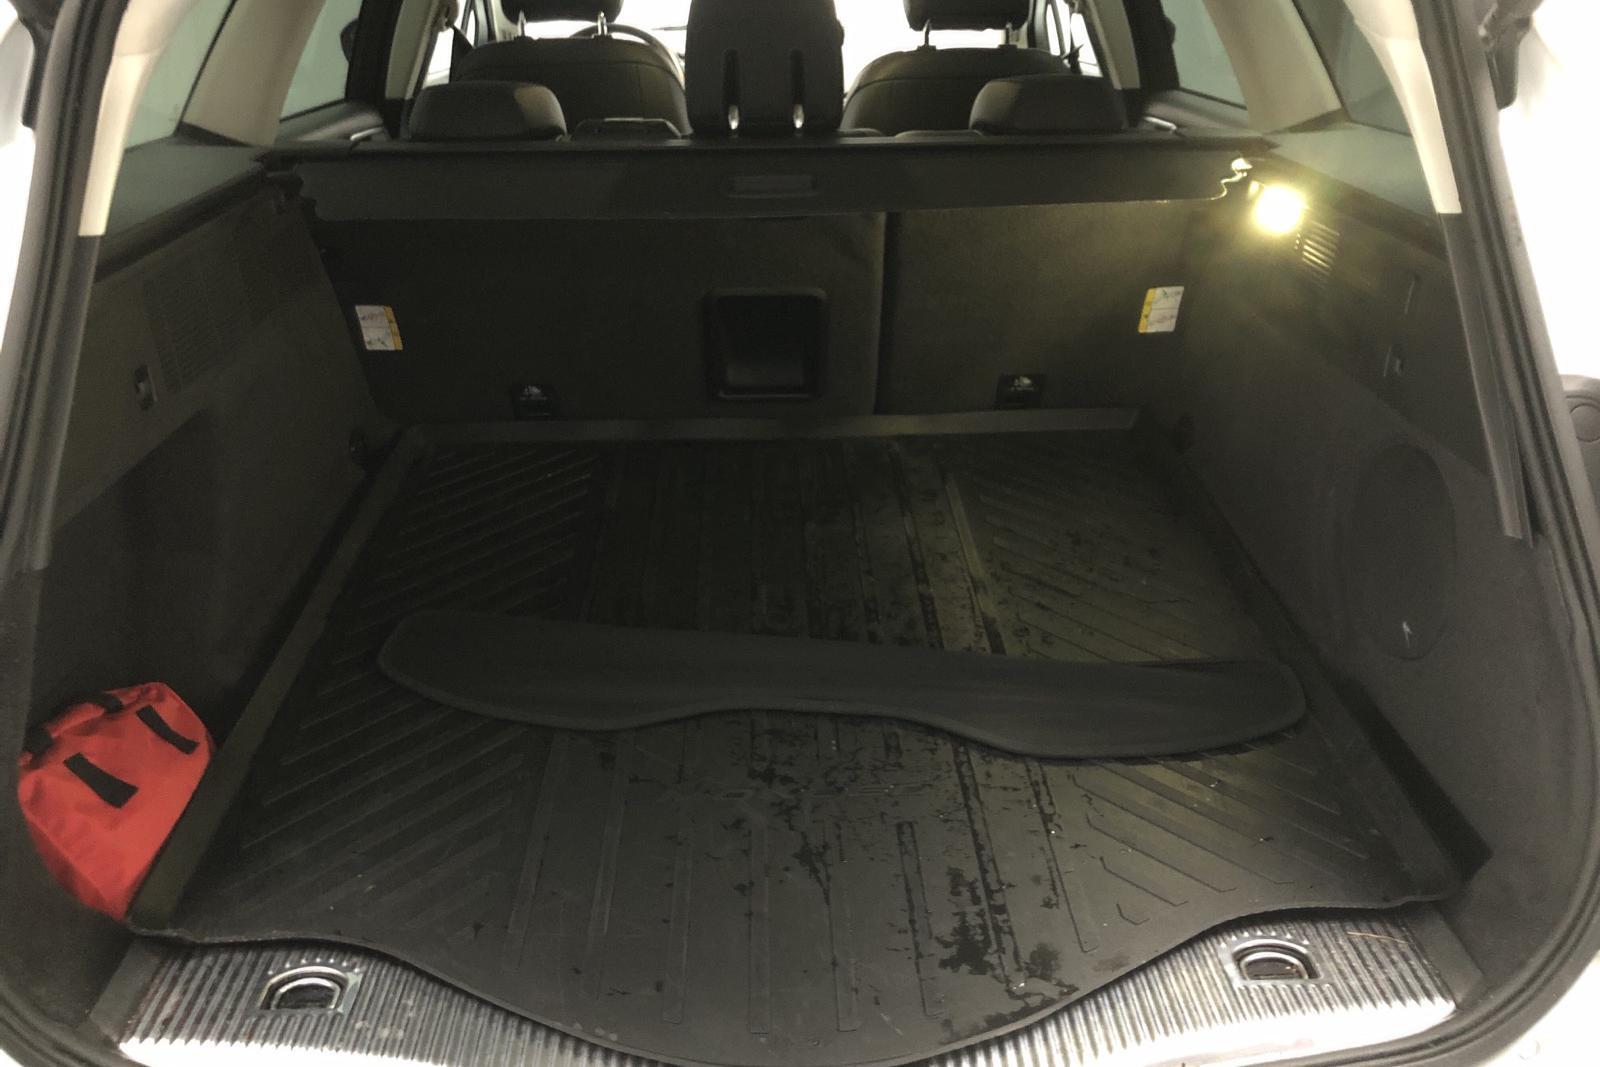 Ford Mondeo 2.0 TDCi Kombi (180hk) - 17 760 mil - Automat - vit - 2016